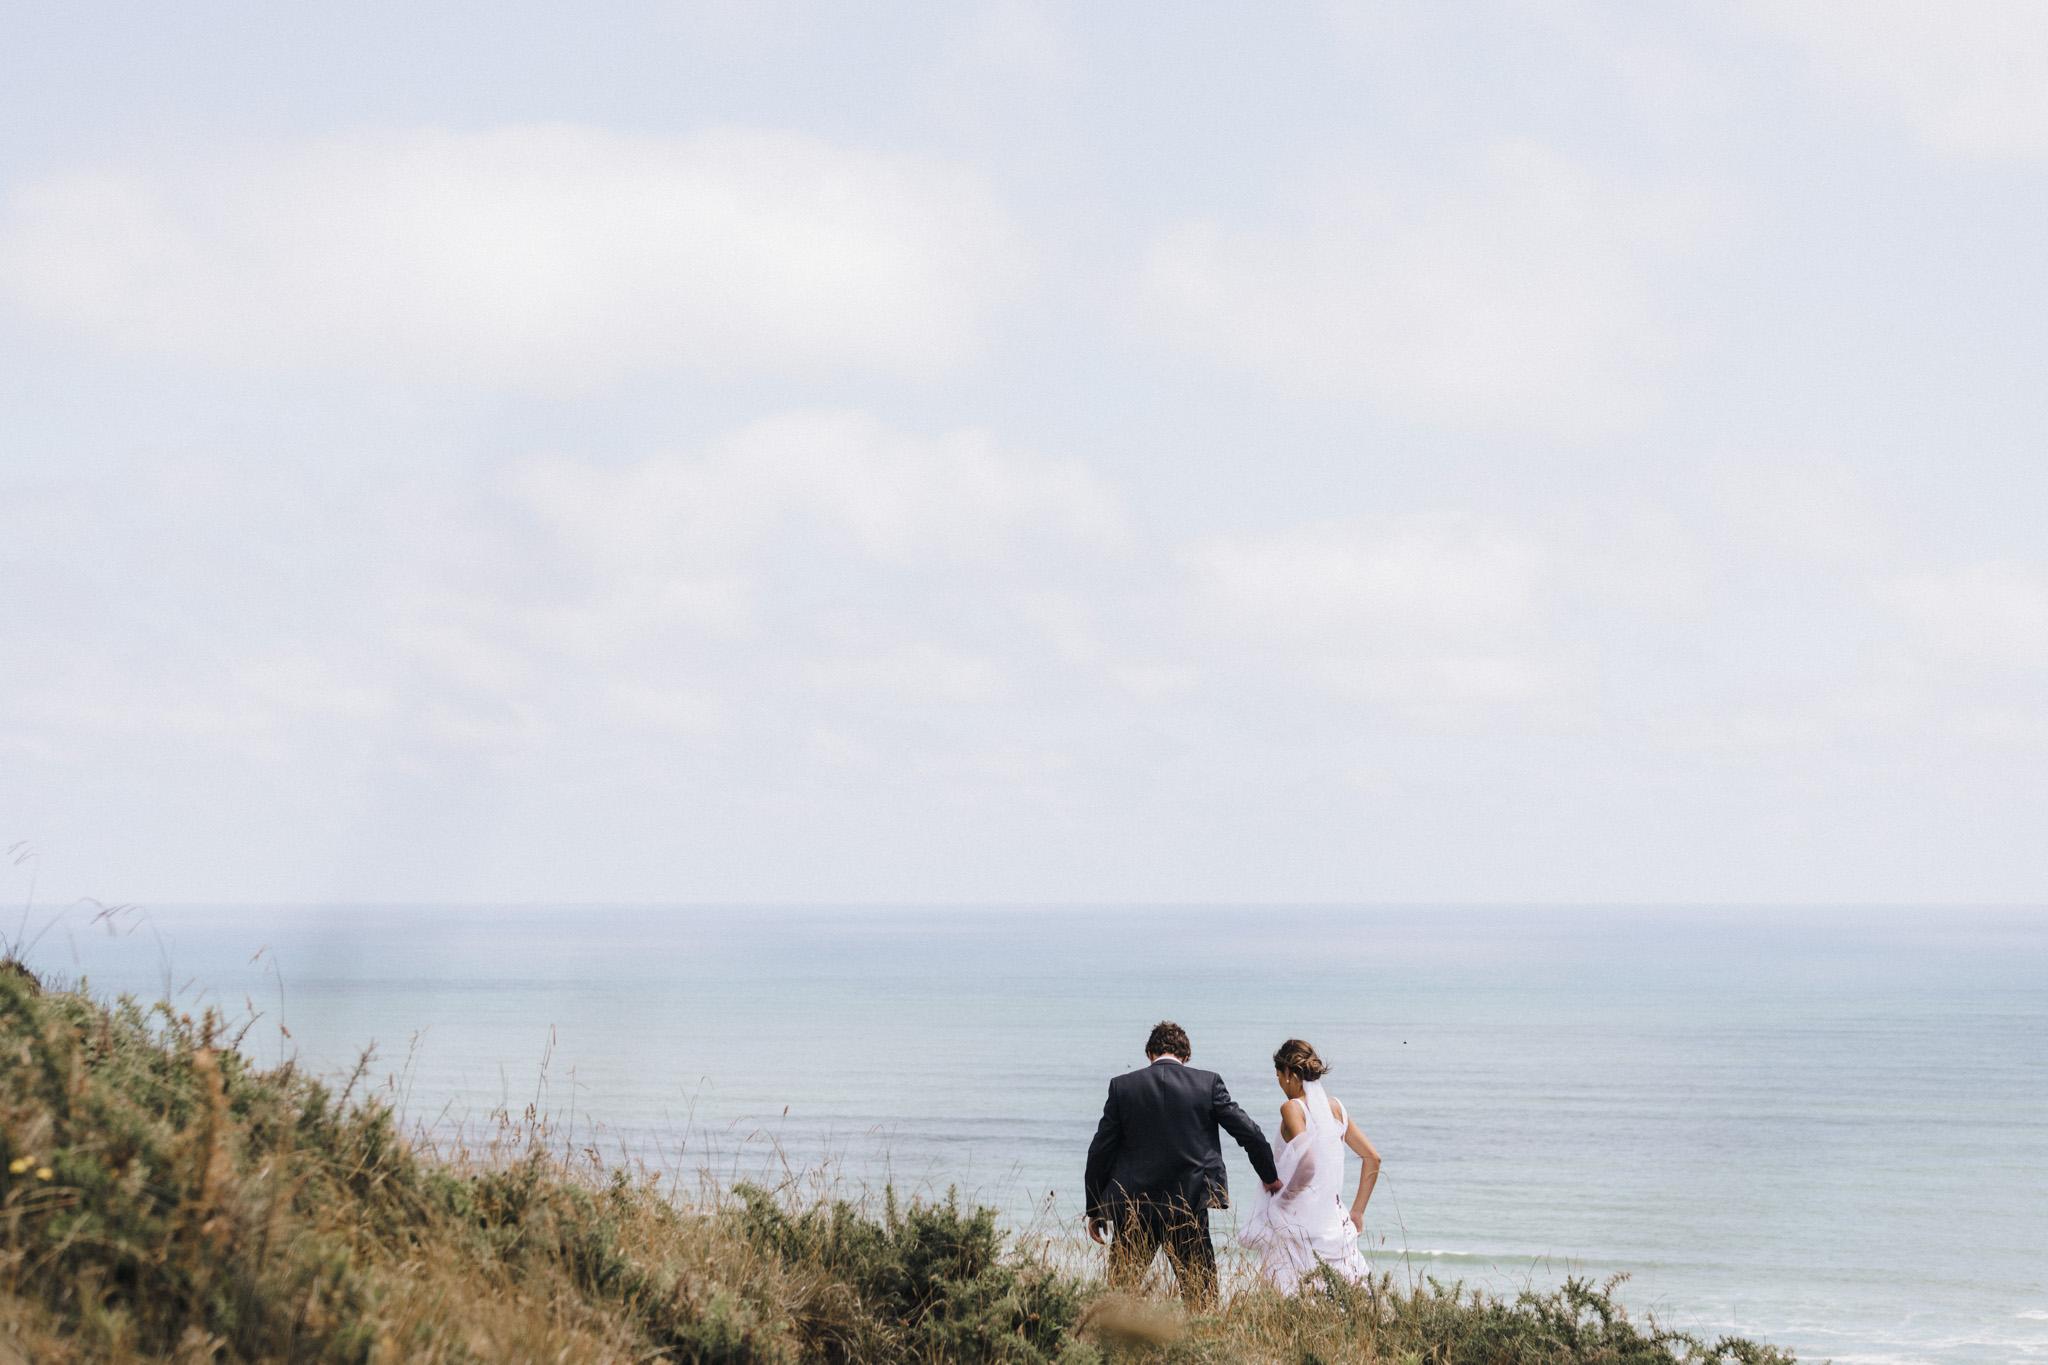 newfound-h-m-castaways-waiuku-auckland-wedding-photographer-72